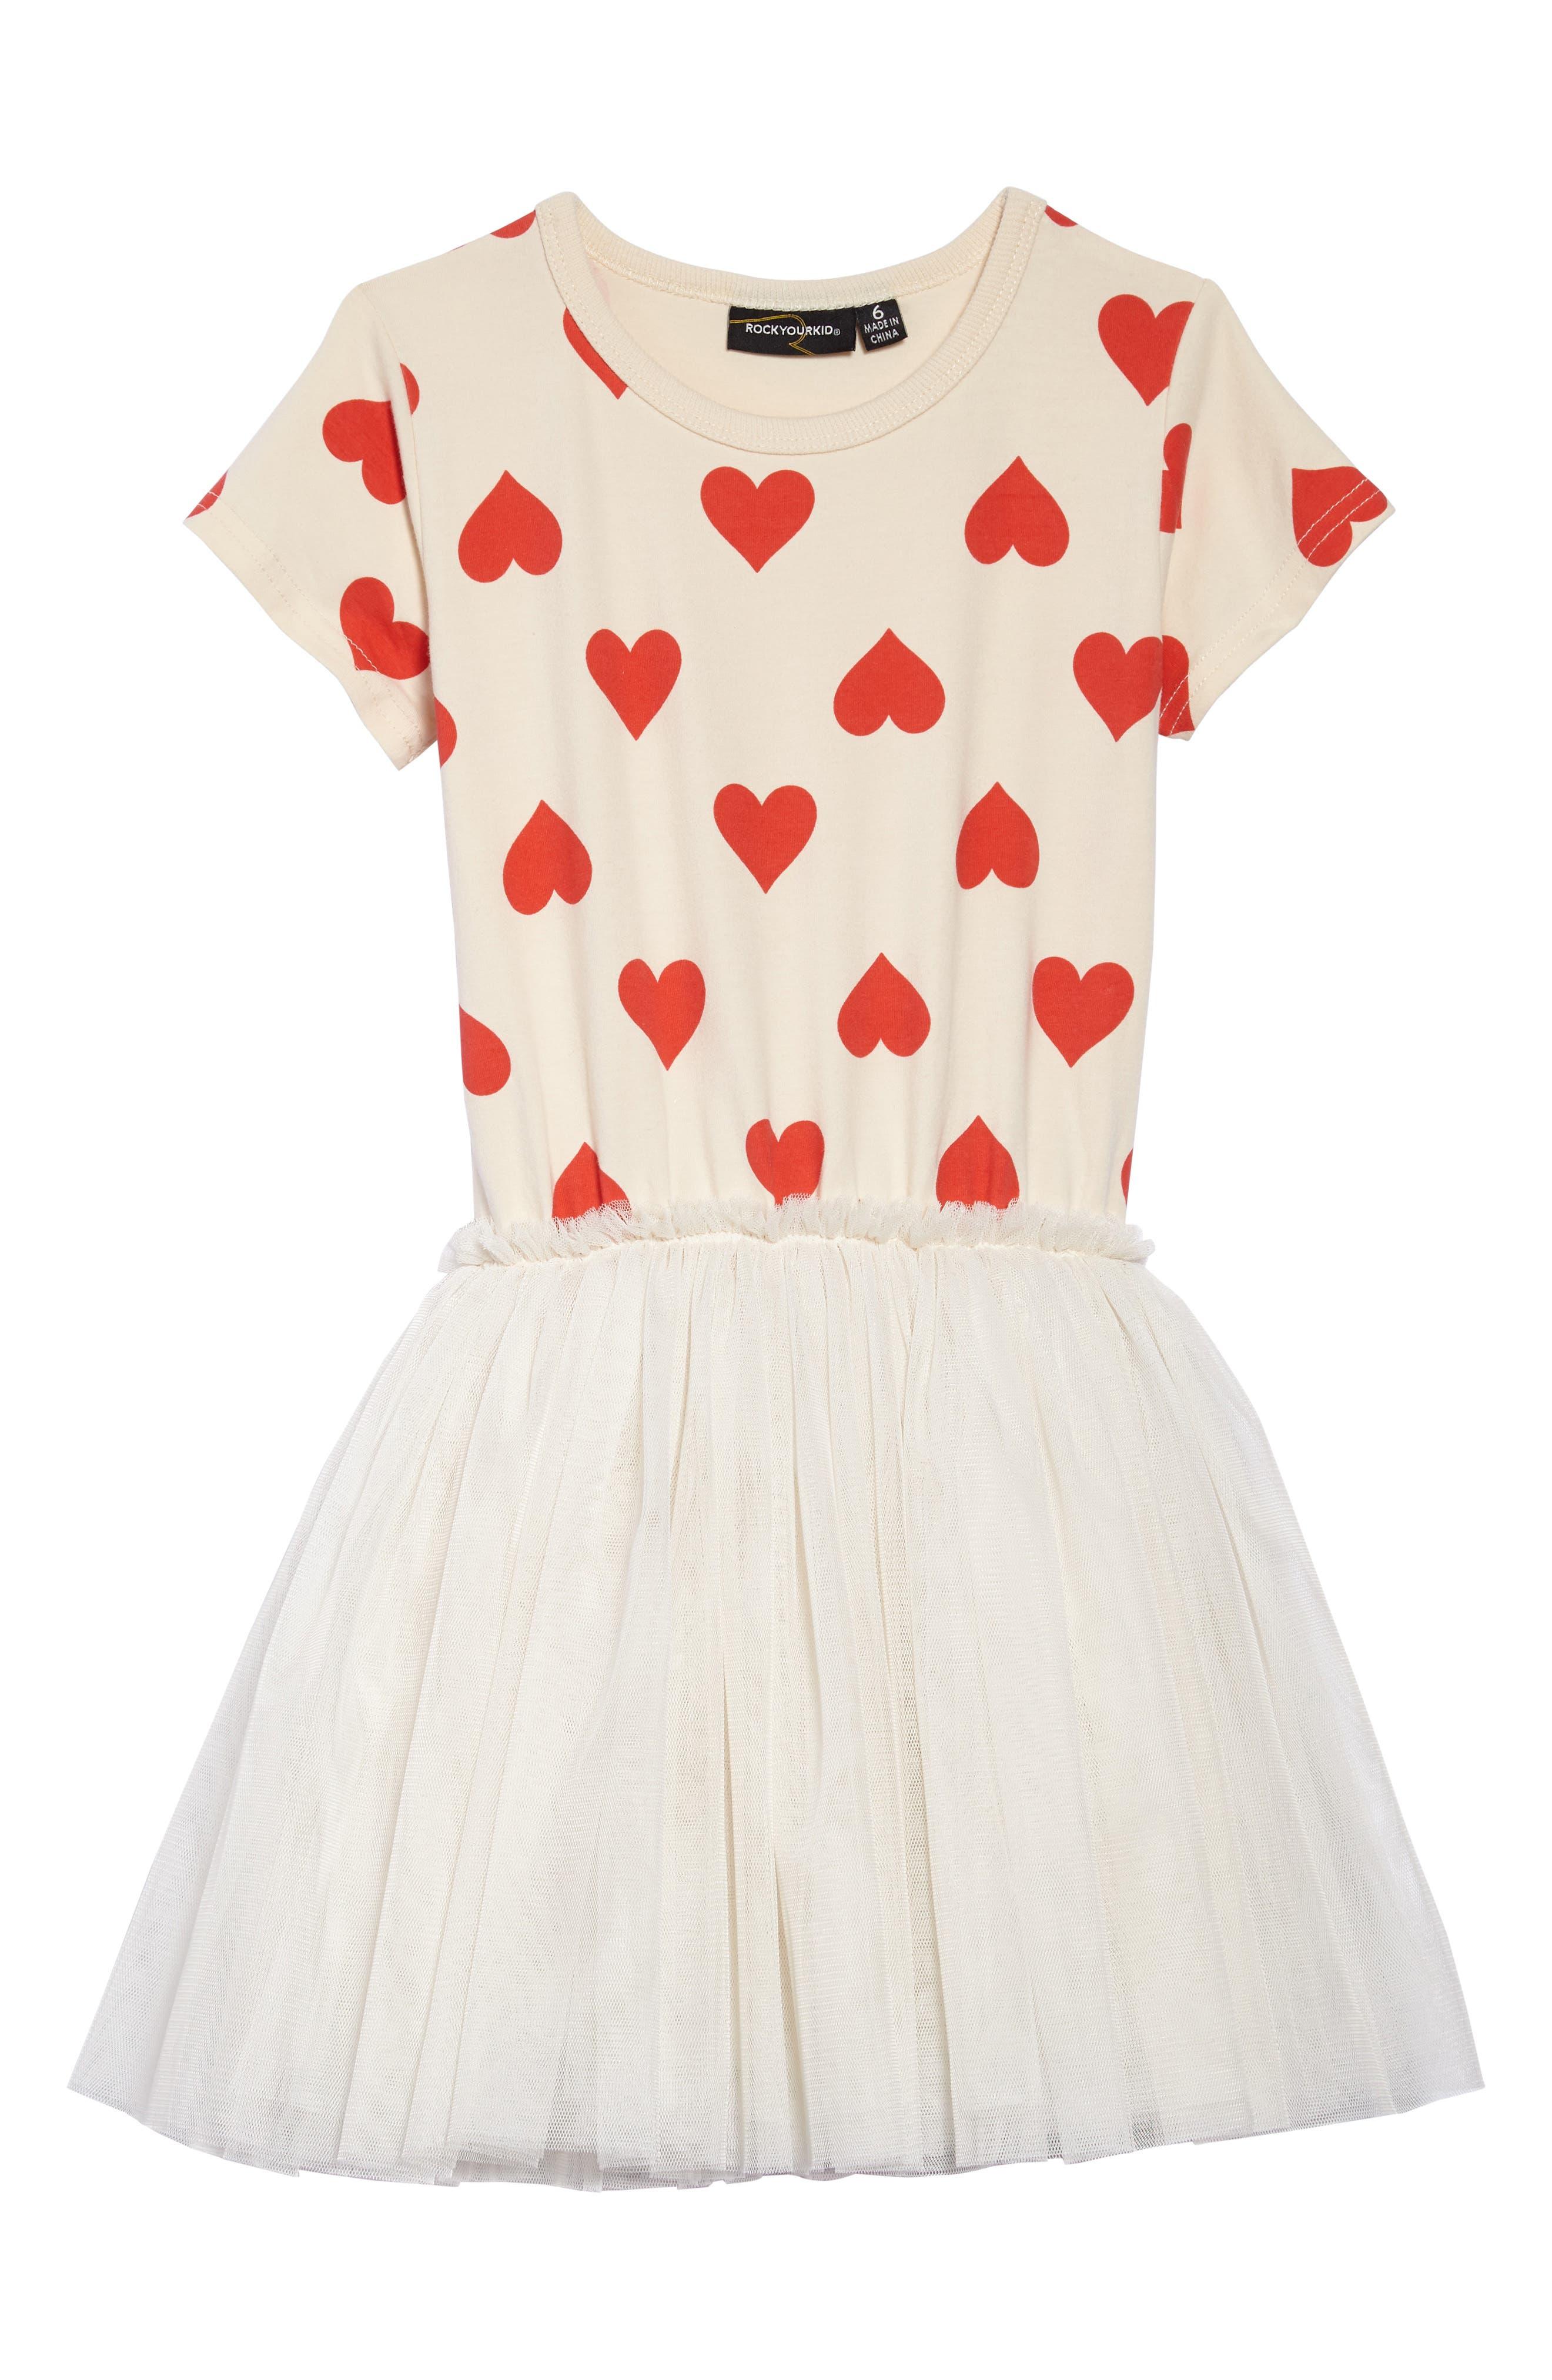 Sweetheart Circus Dress,                         Main,                         color, Oatmeal